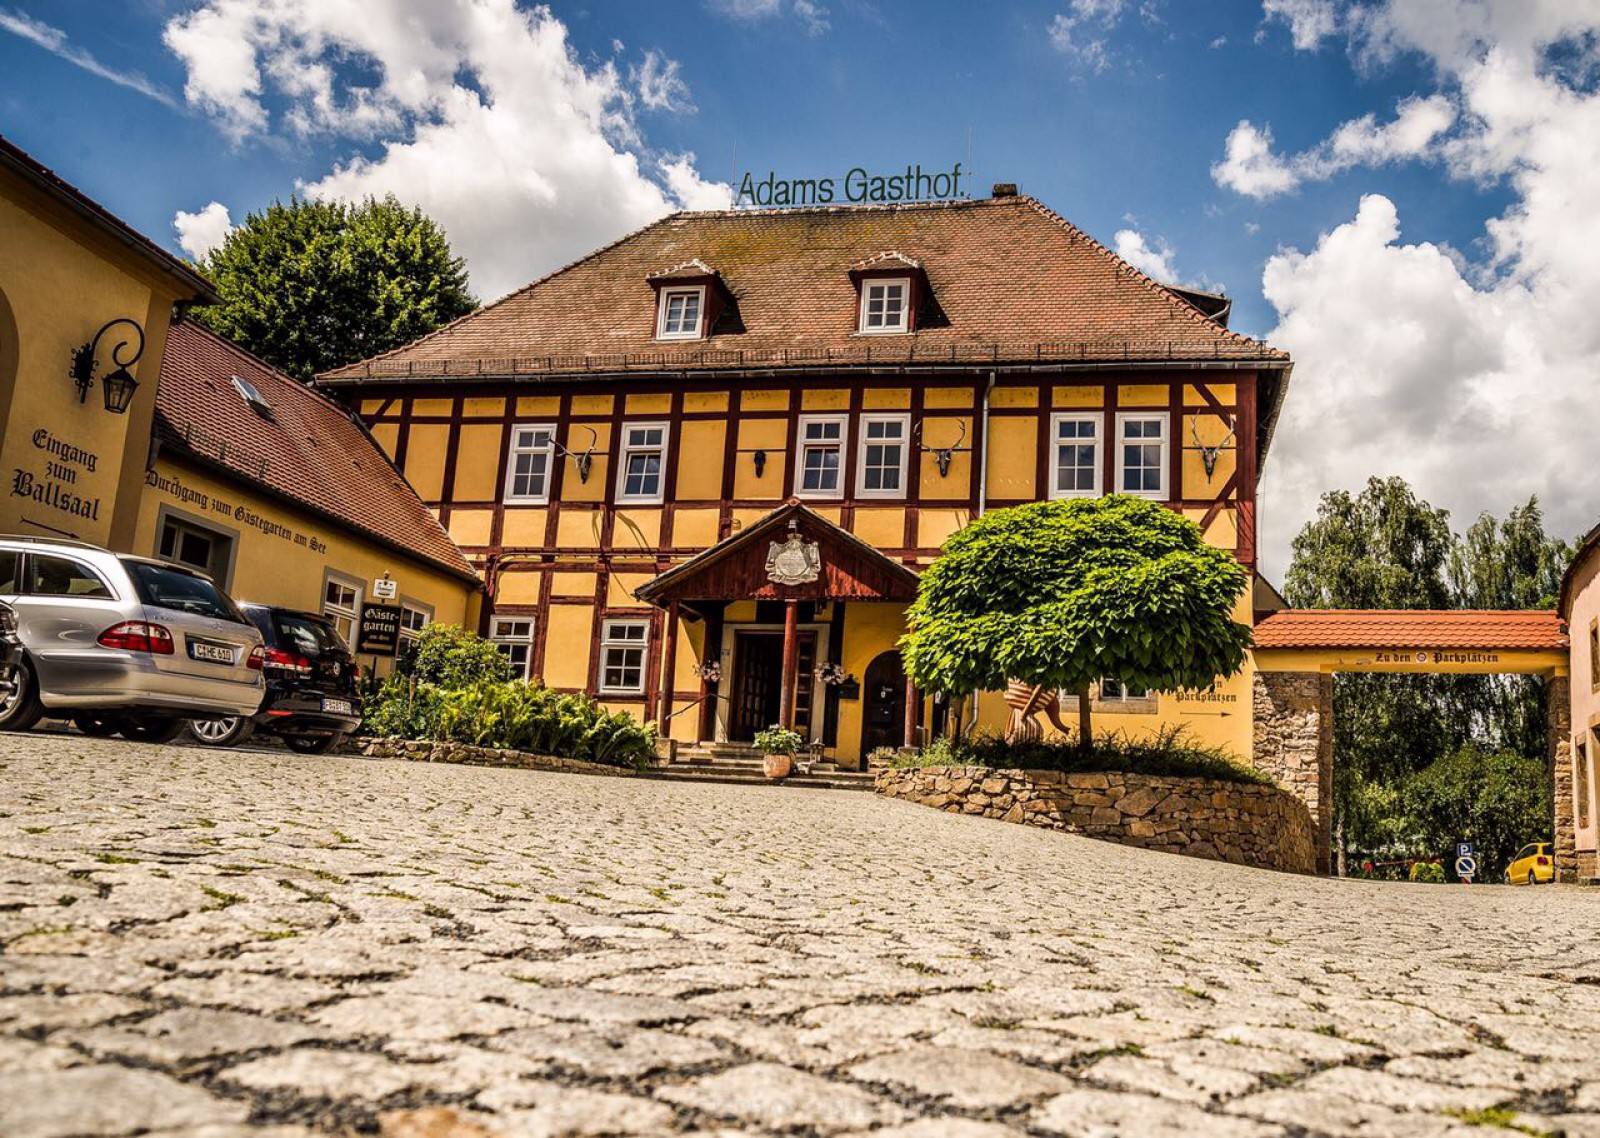 Restaurant Adams Gasthof in Moritzburg